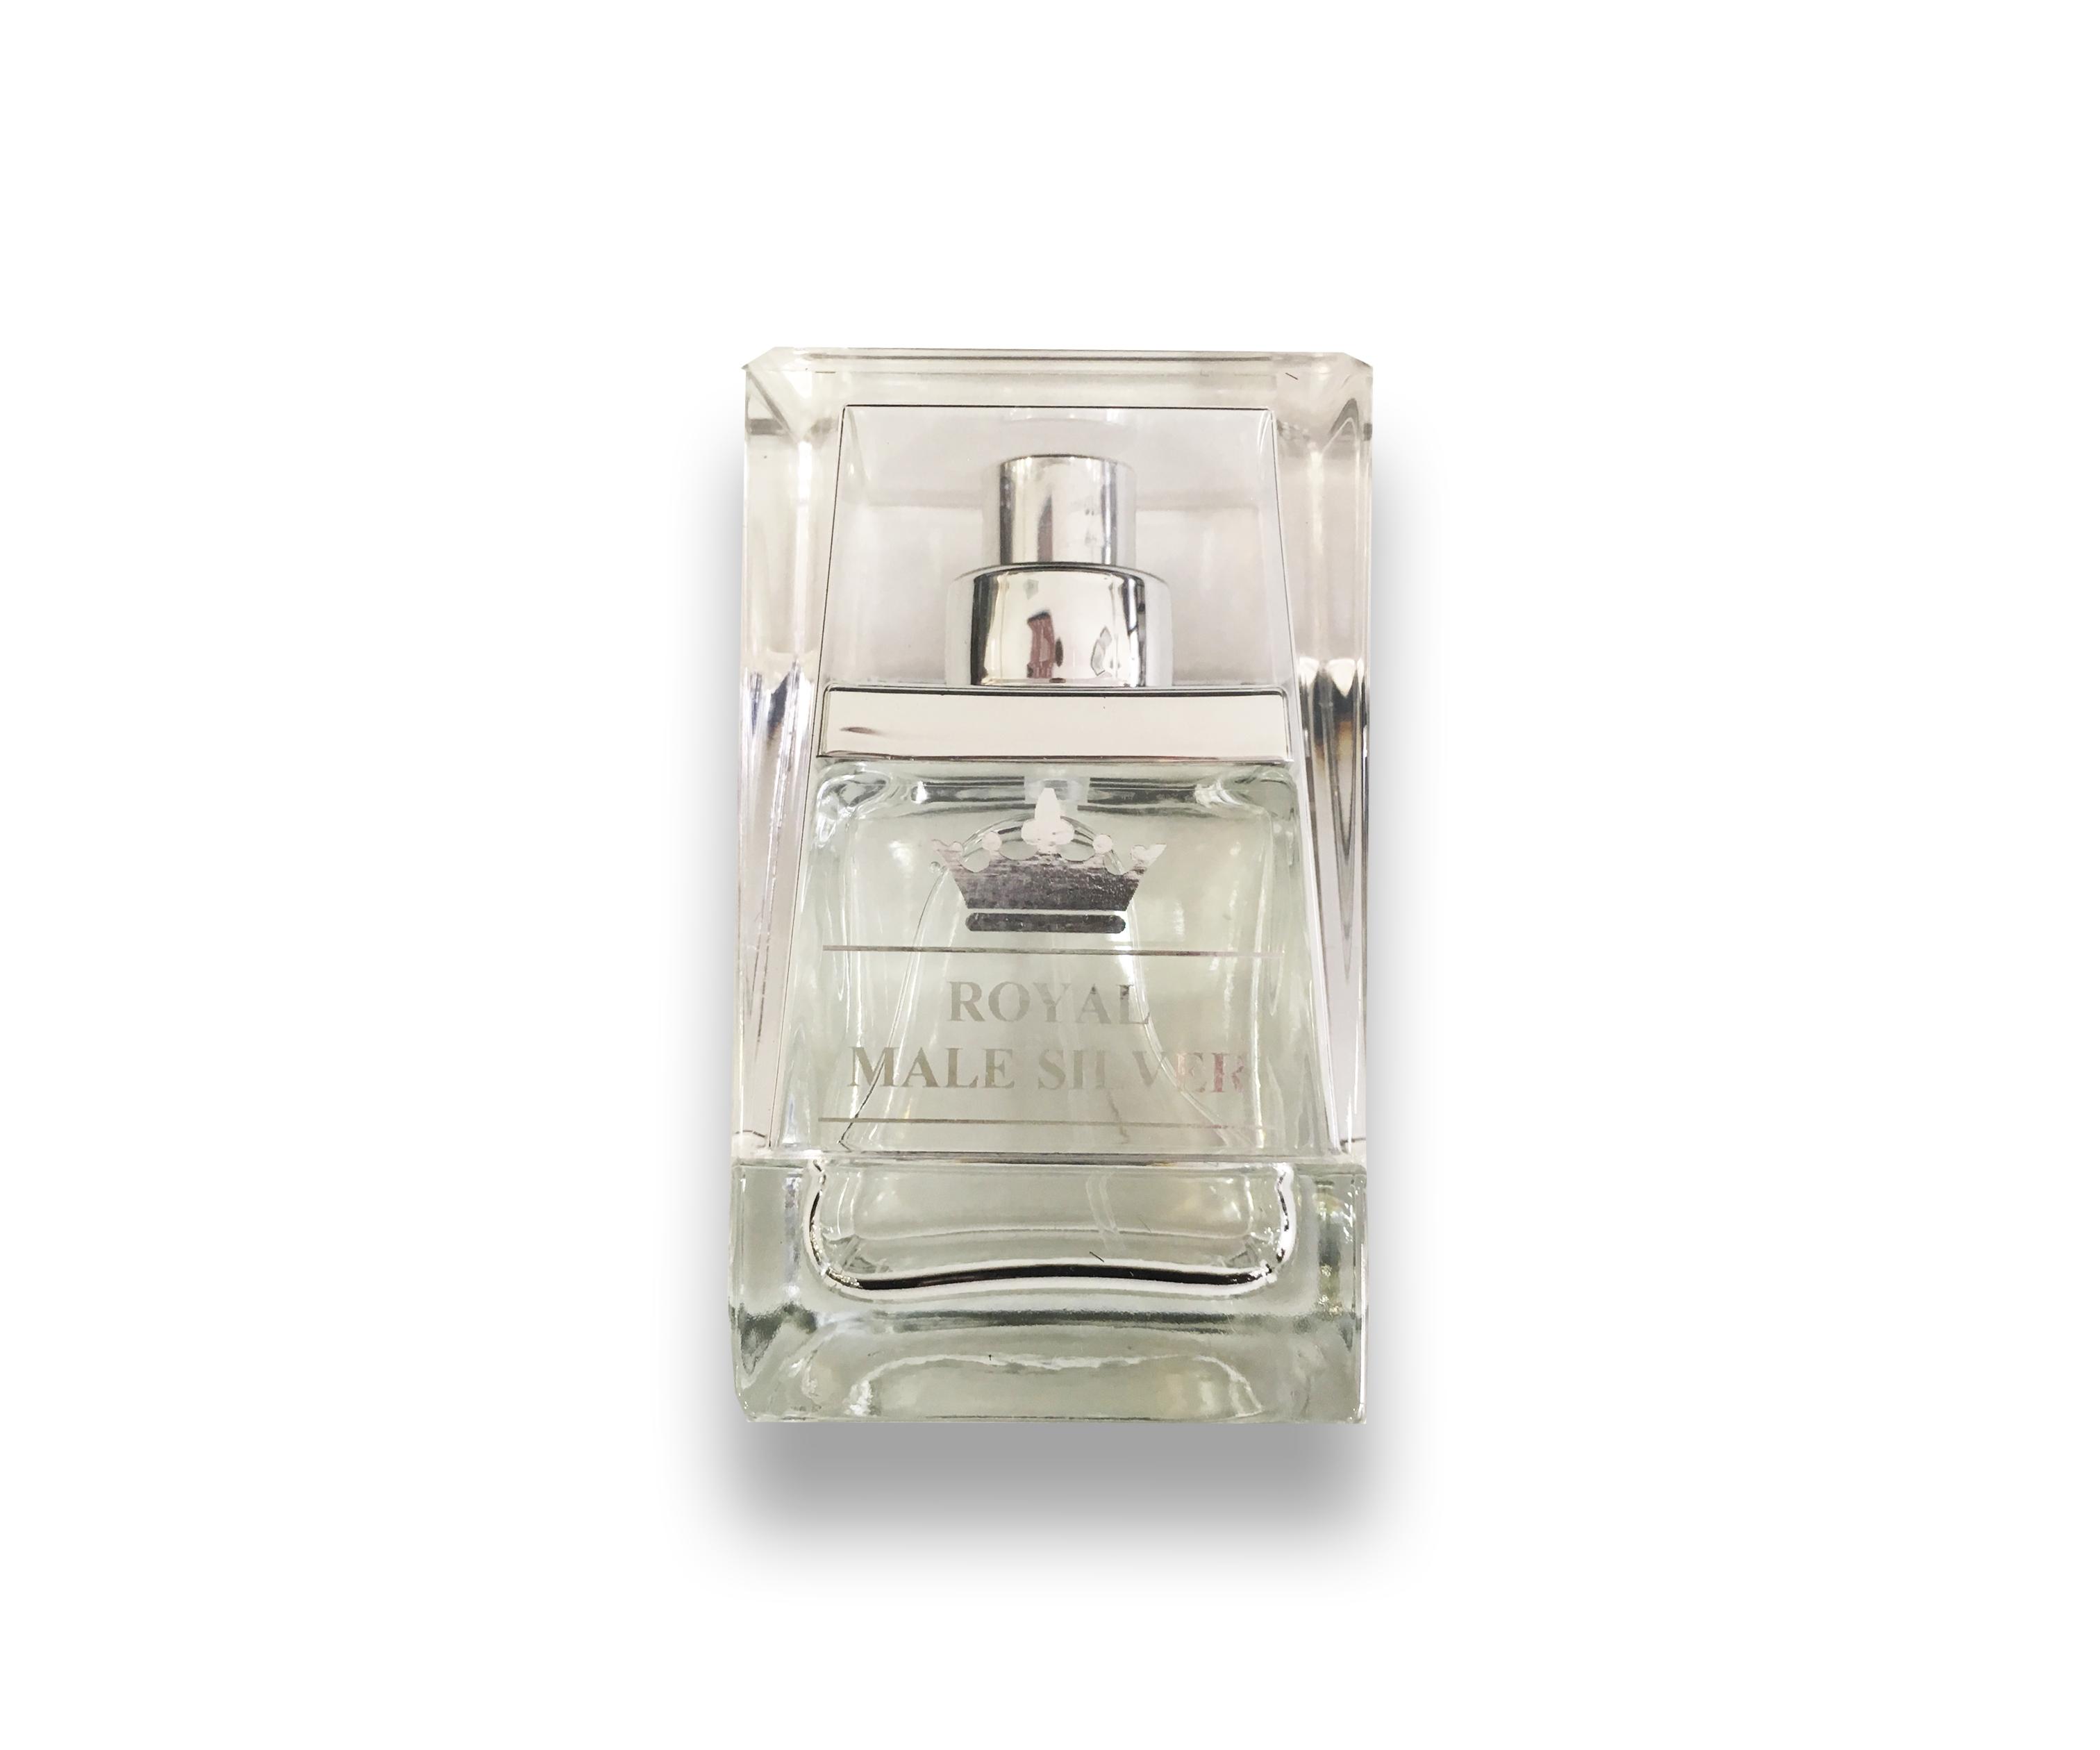 Fragrance: Silver